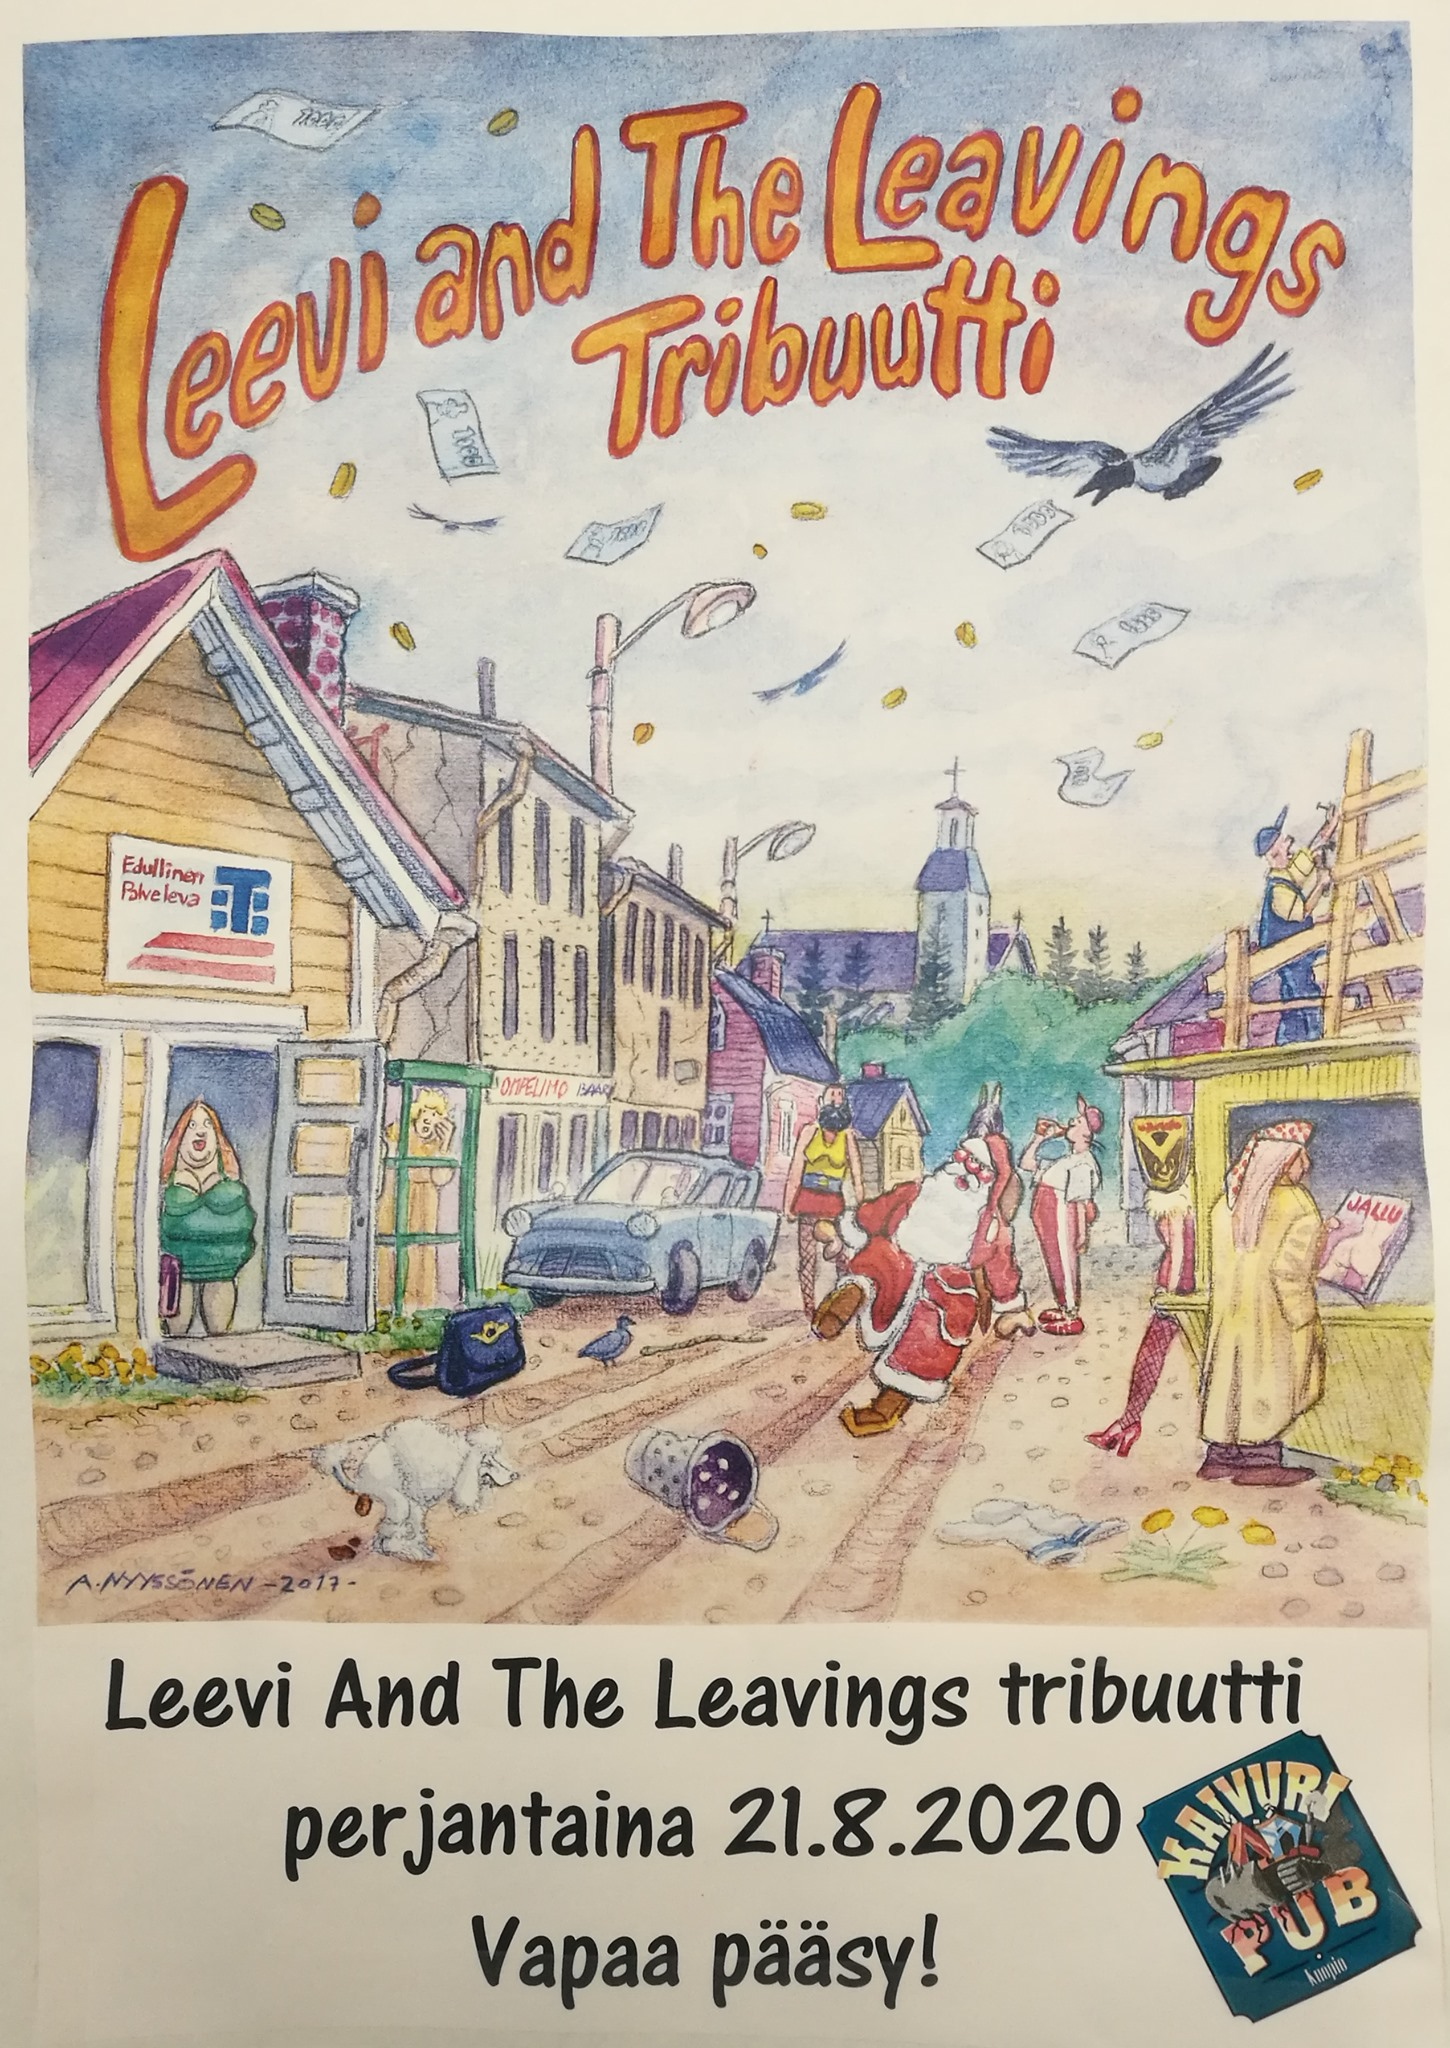 PE 21.8.2020 Leevi and The Leavings Tribuutti